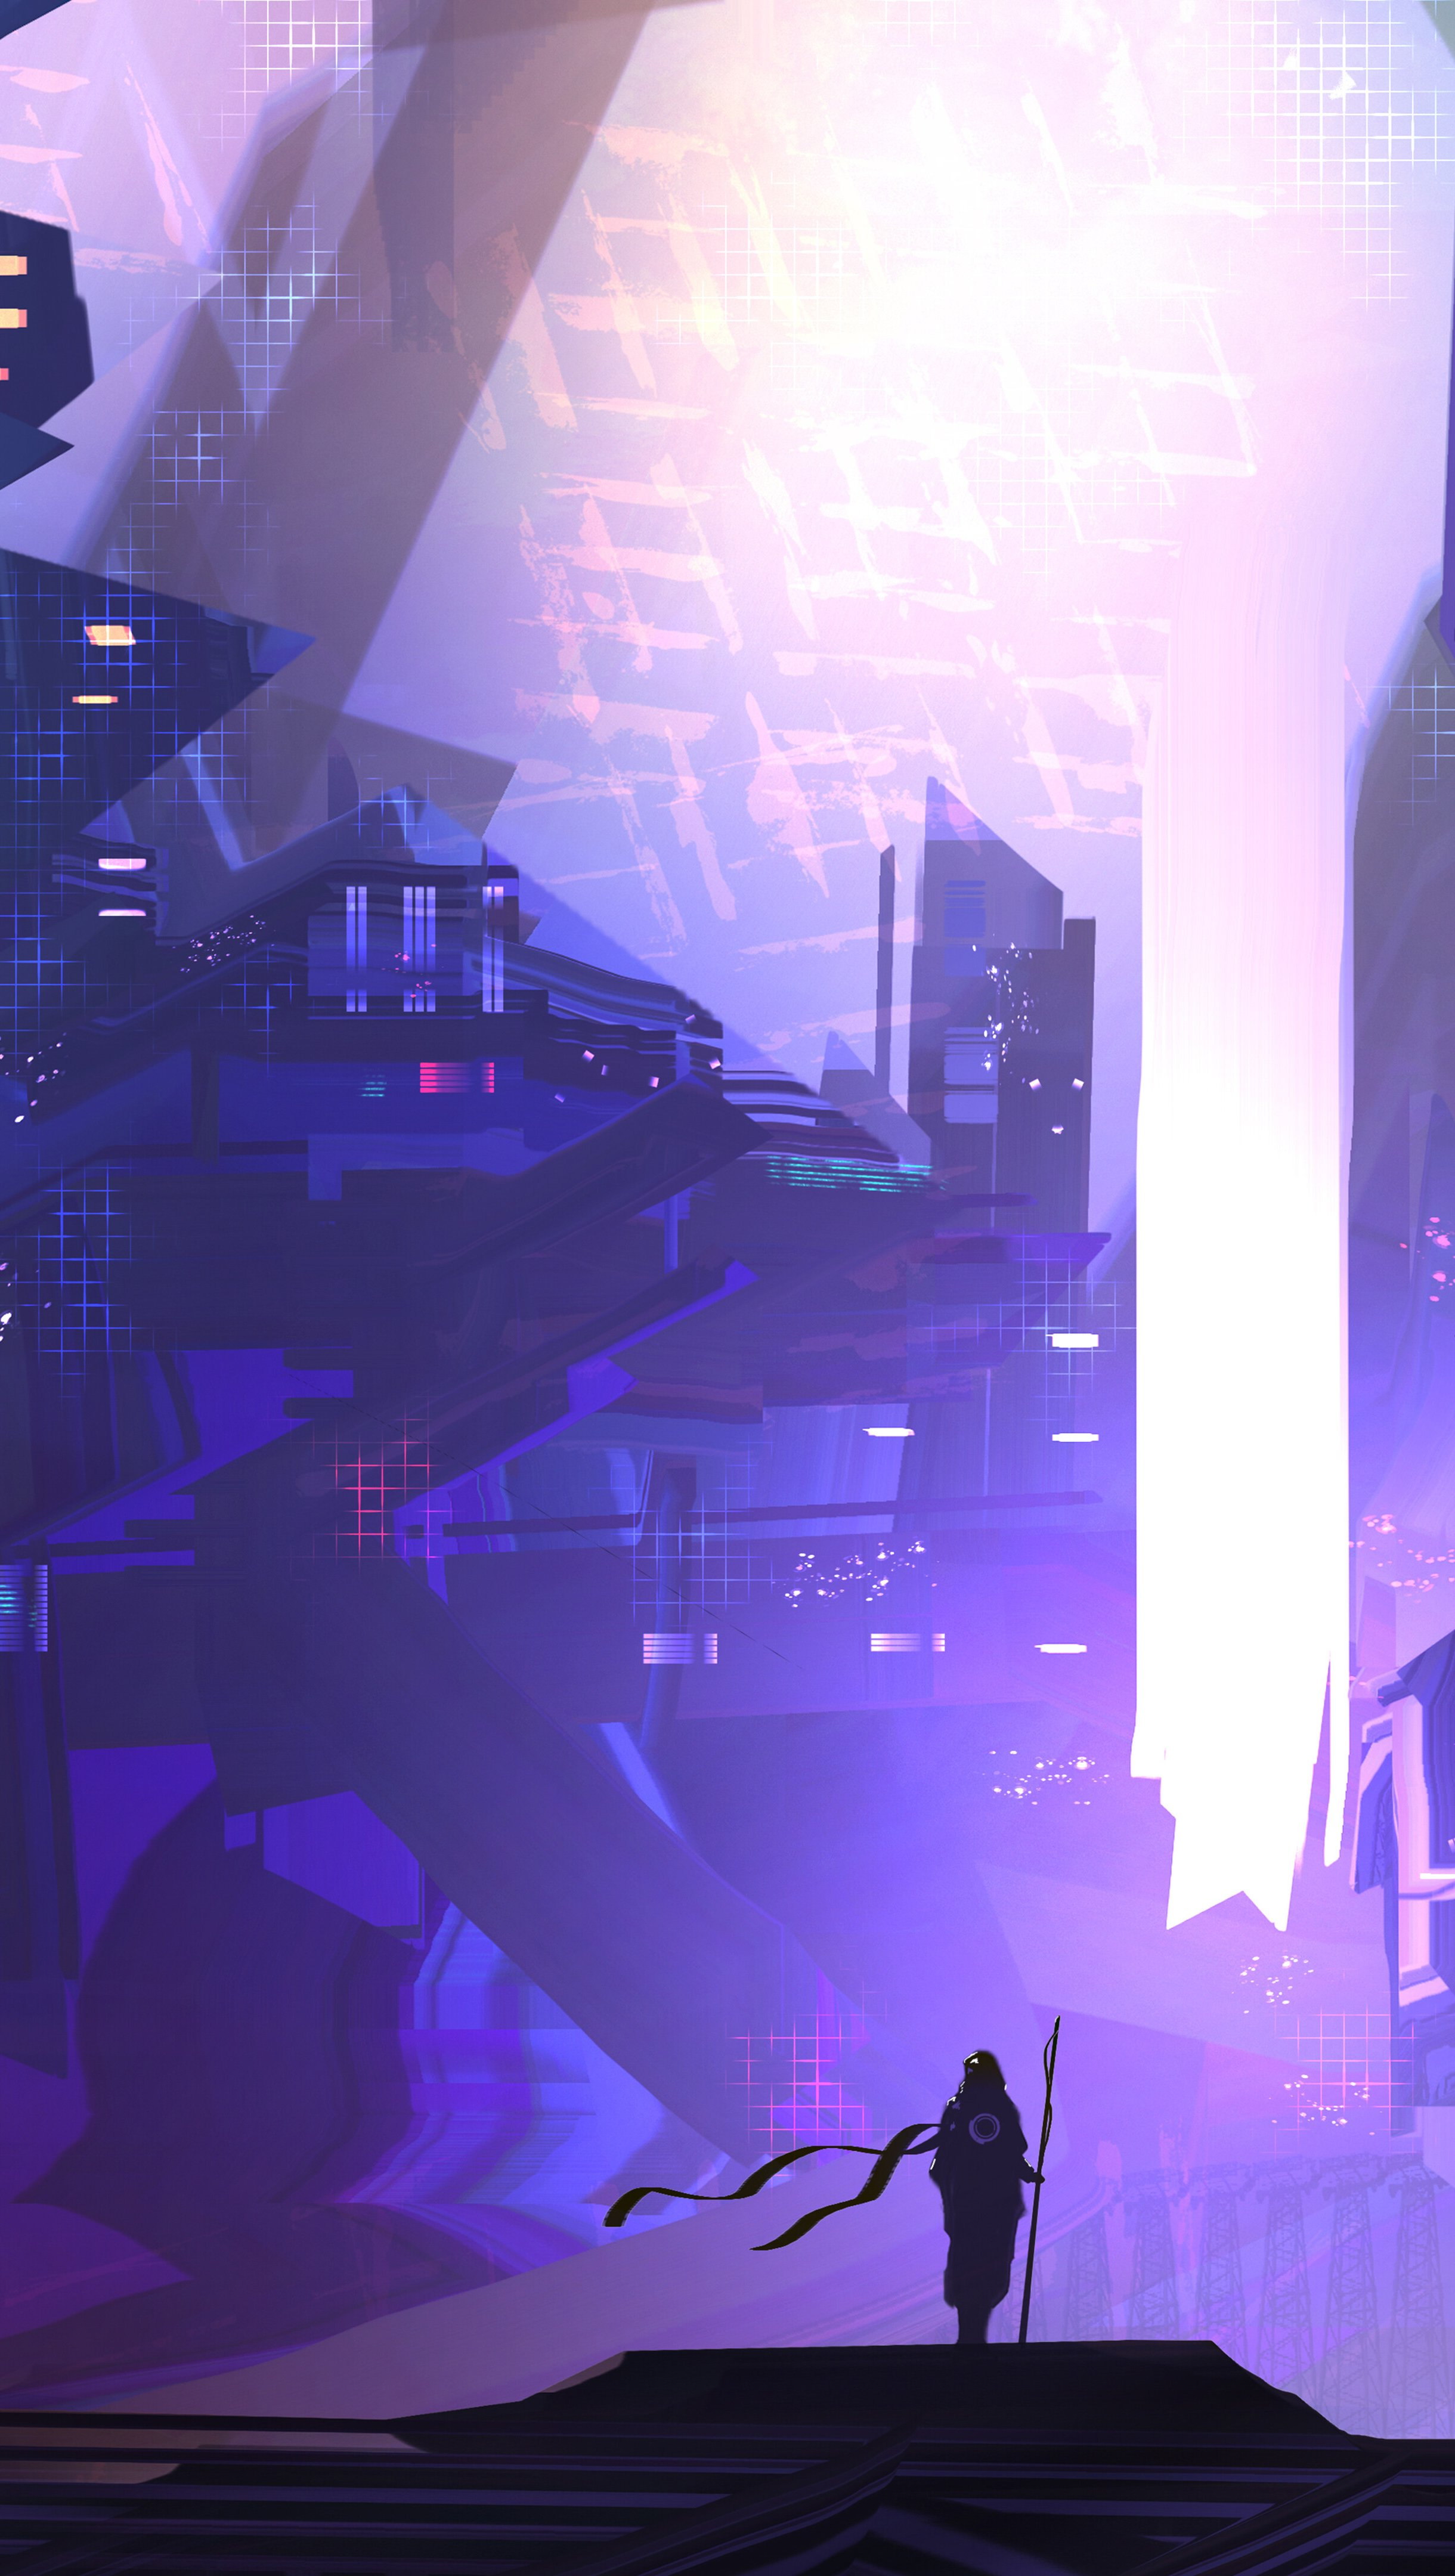 Wallpaper Science fiction city digital art Vertical